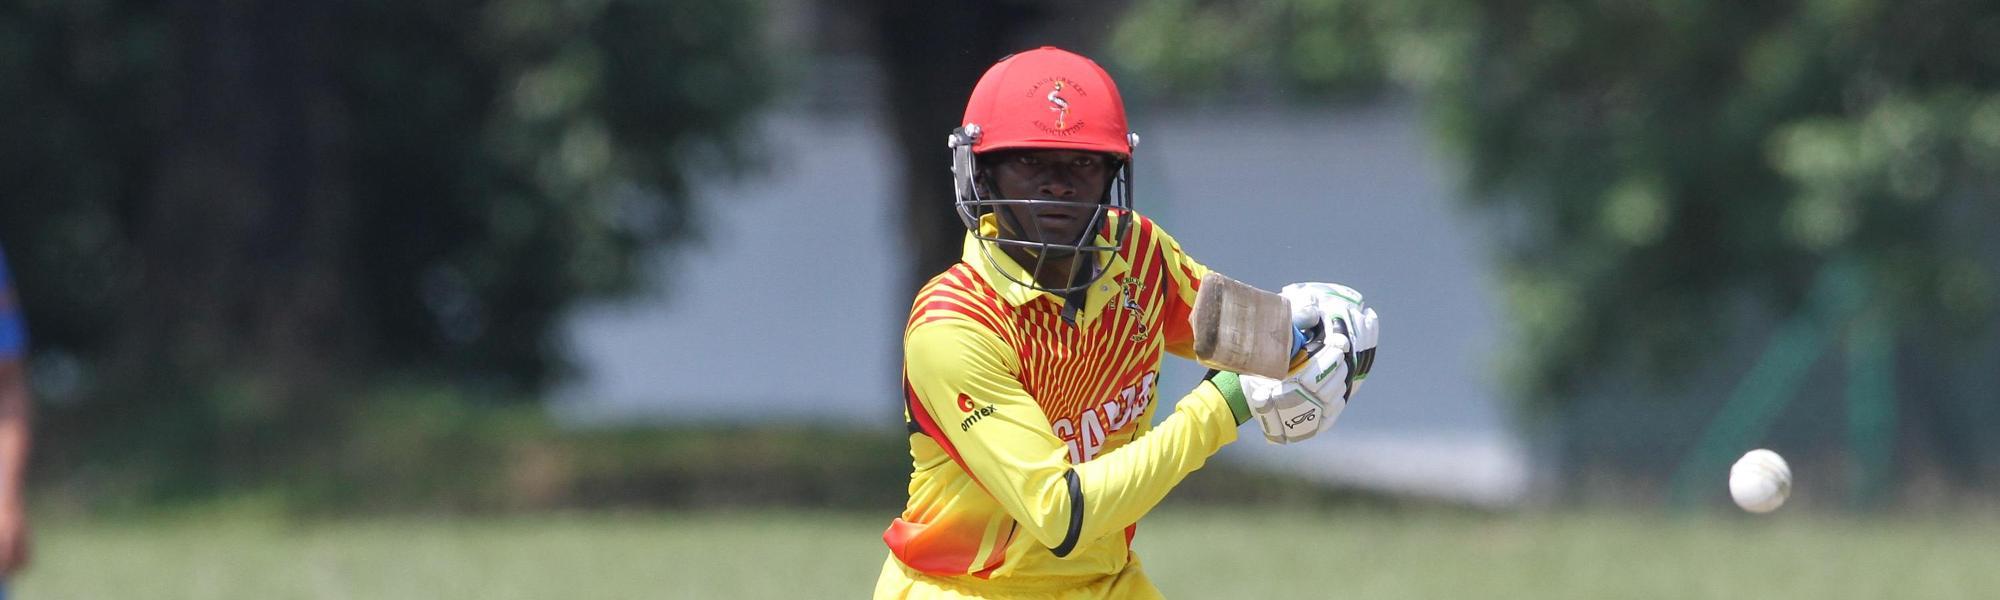 Brian Masaba of Uganda plays a shot